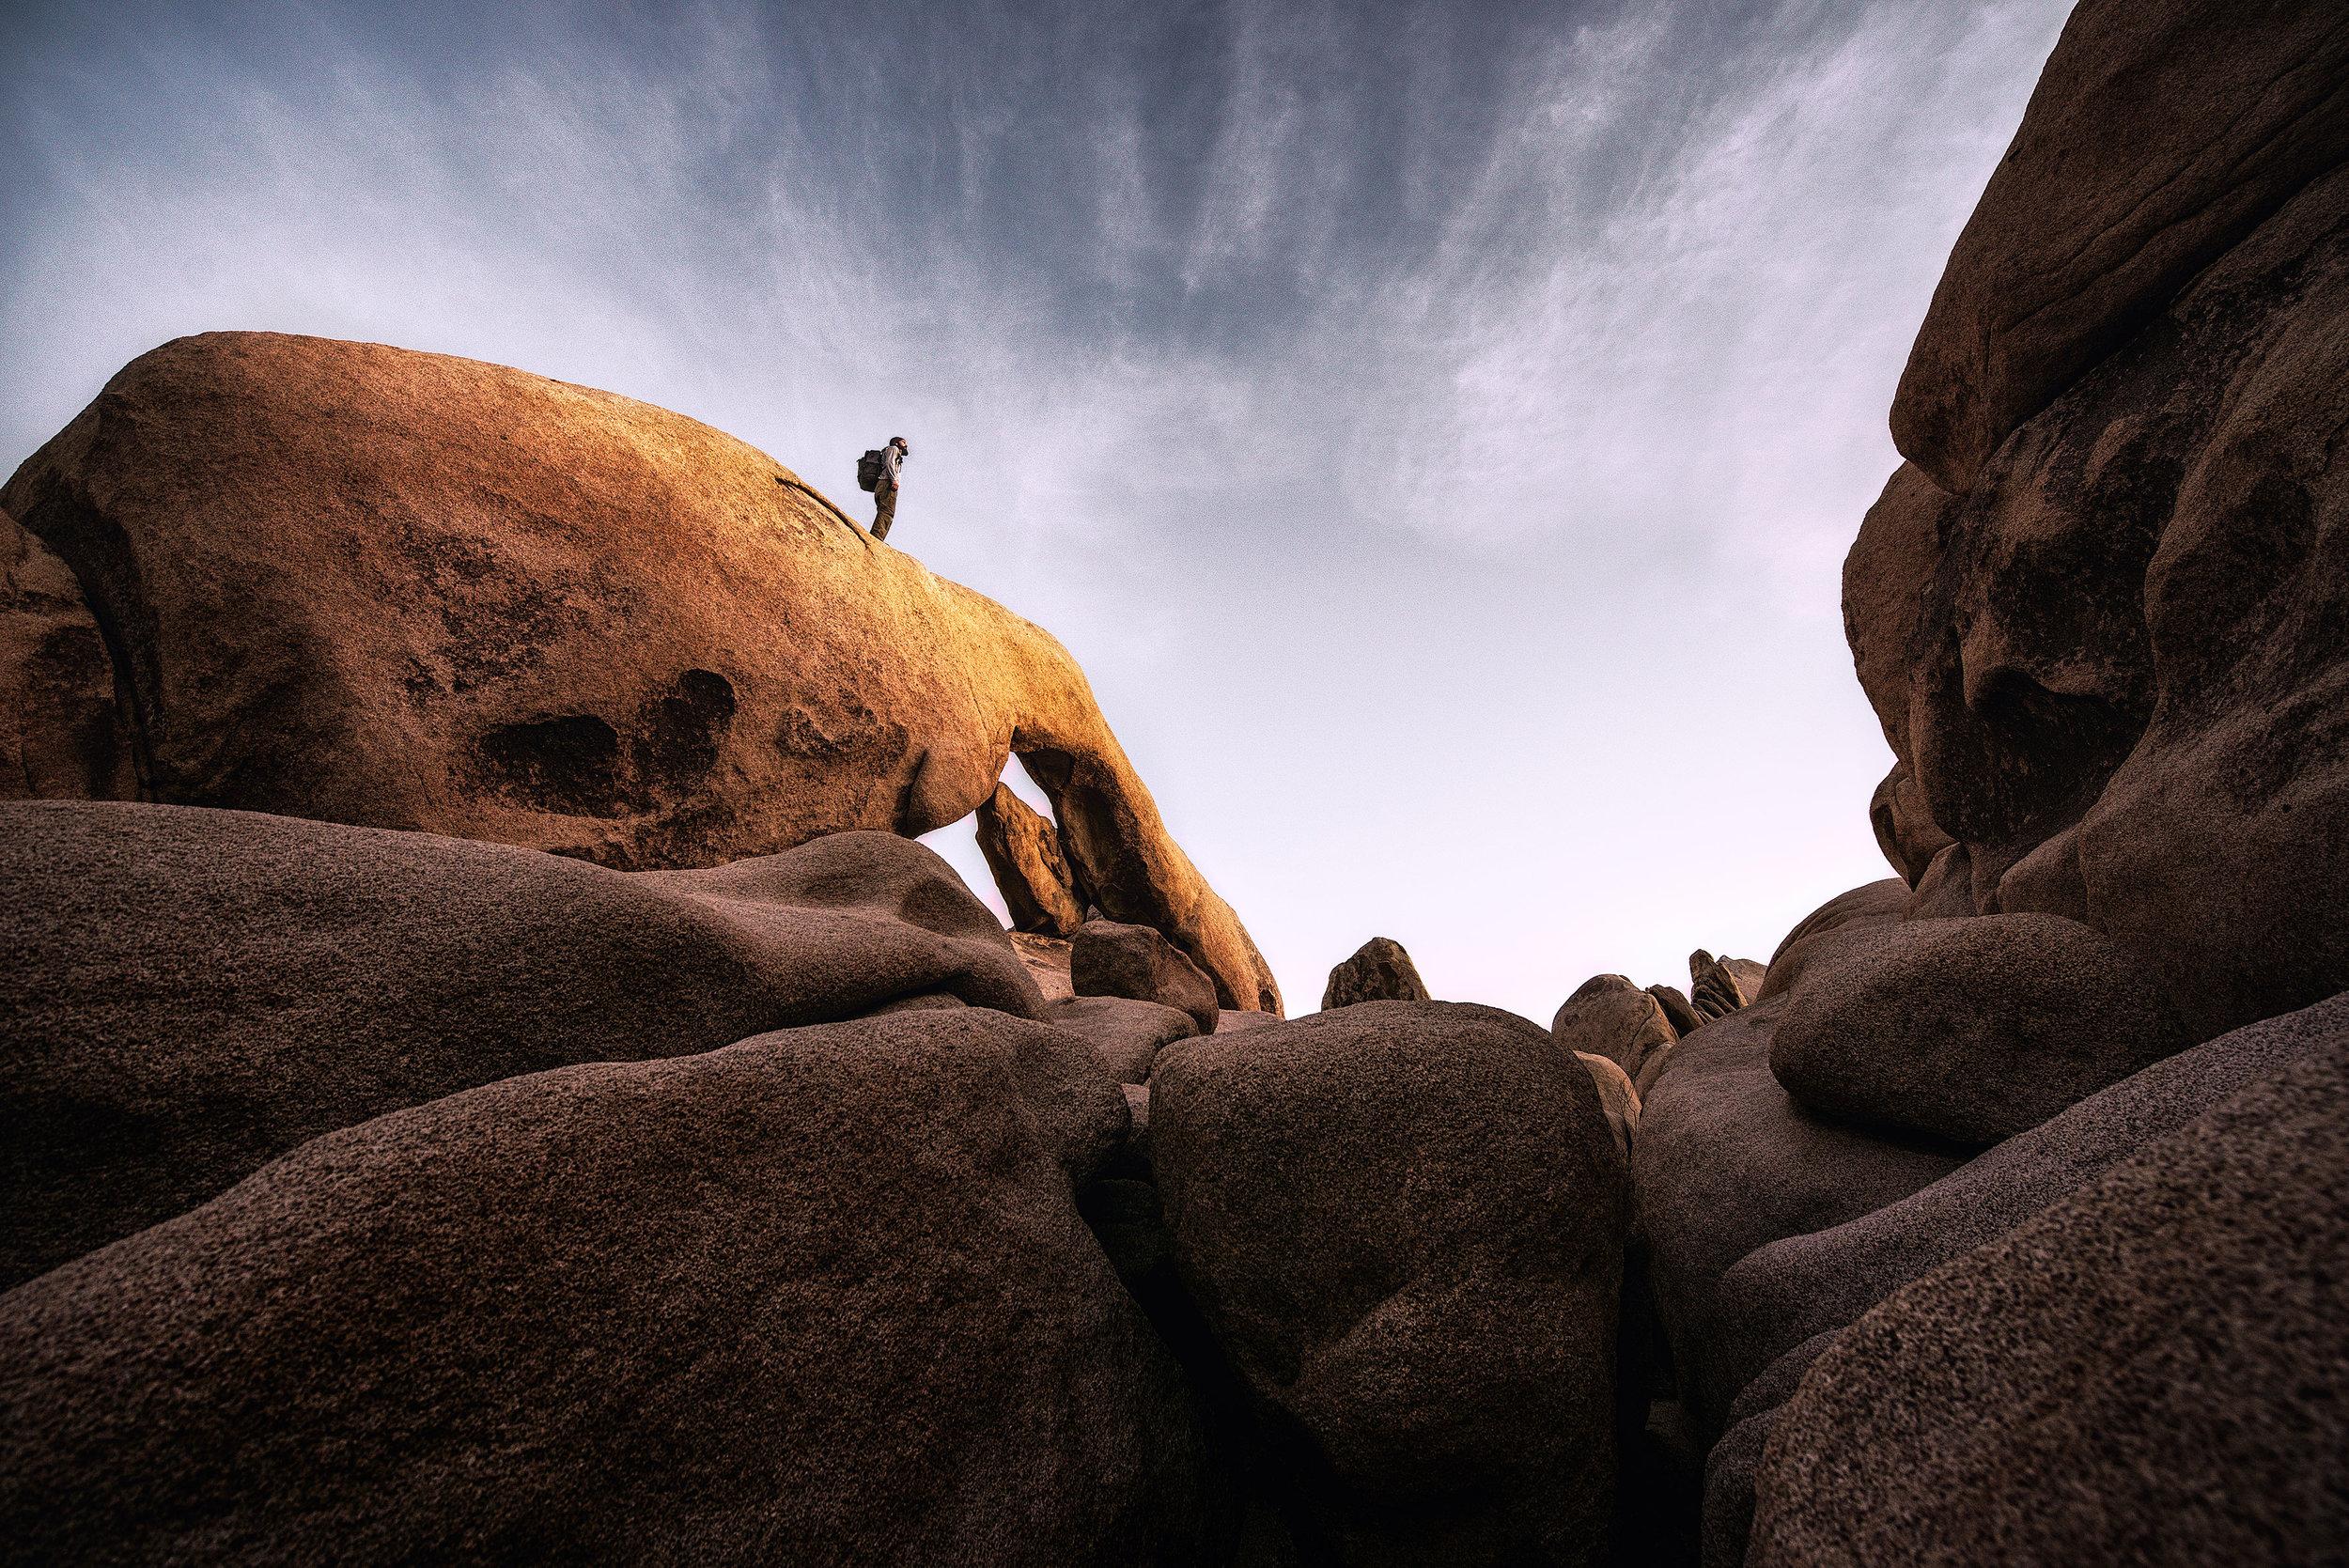 austin-trigg-joshua-tree-national-park-arch-rock-sunset-explore.jpg